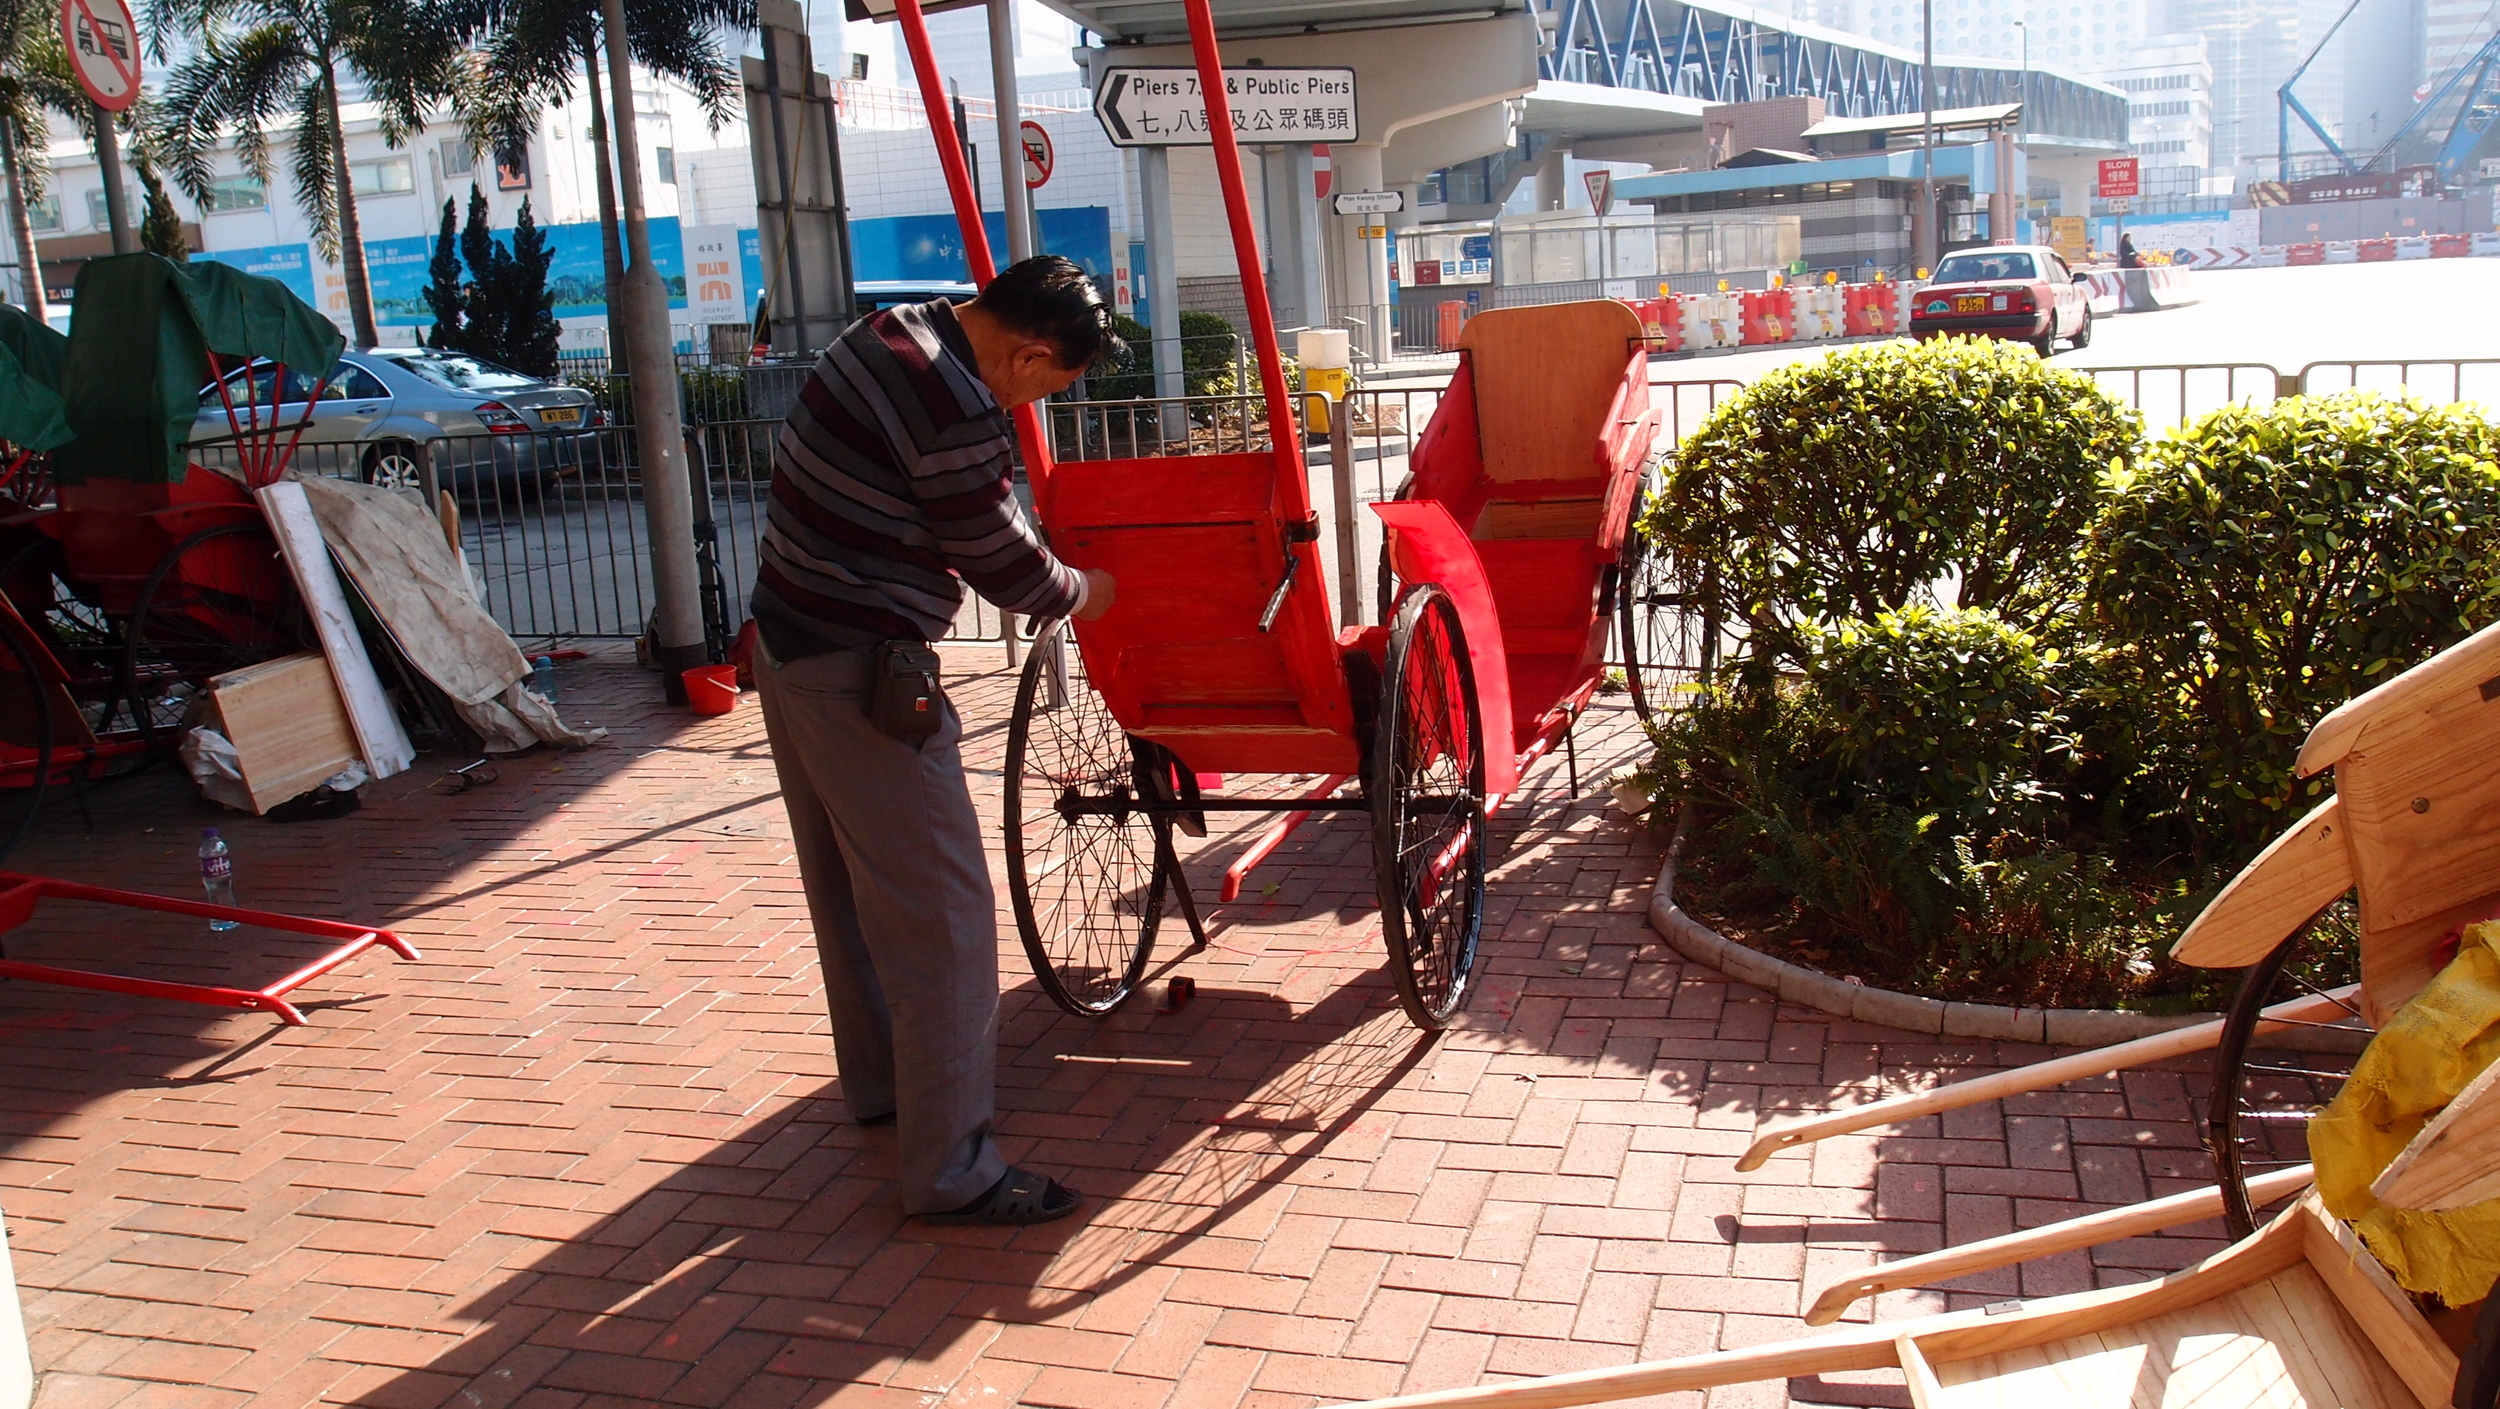 Doubling the number of rickshaws in Hong Kong